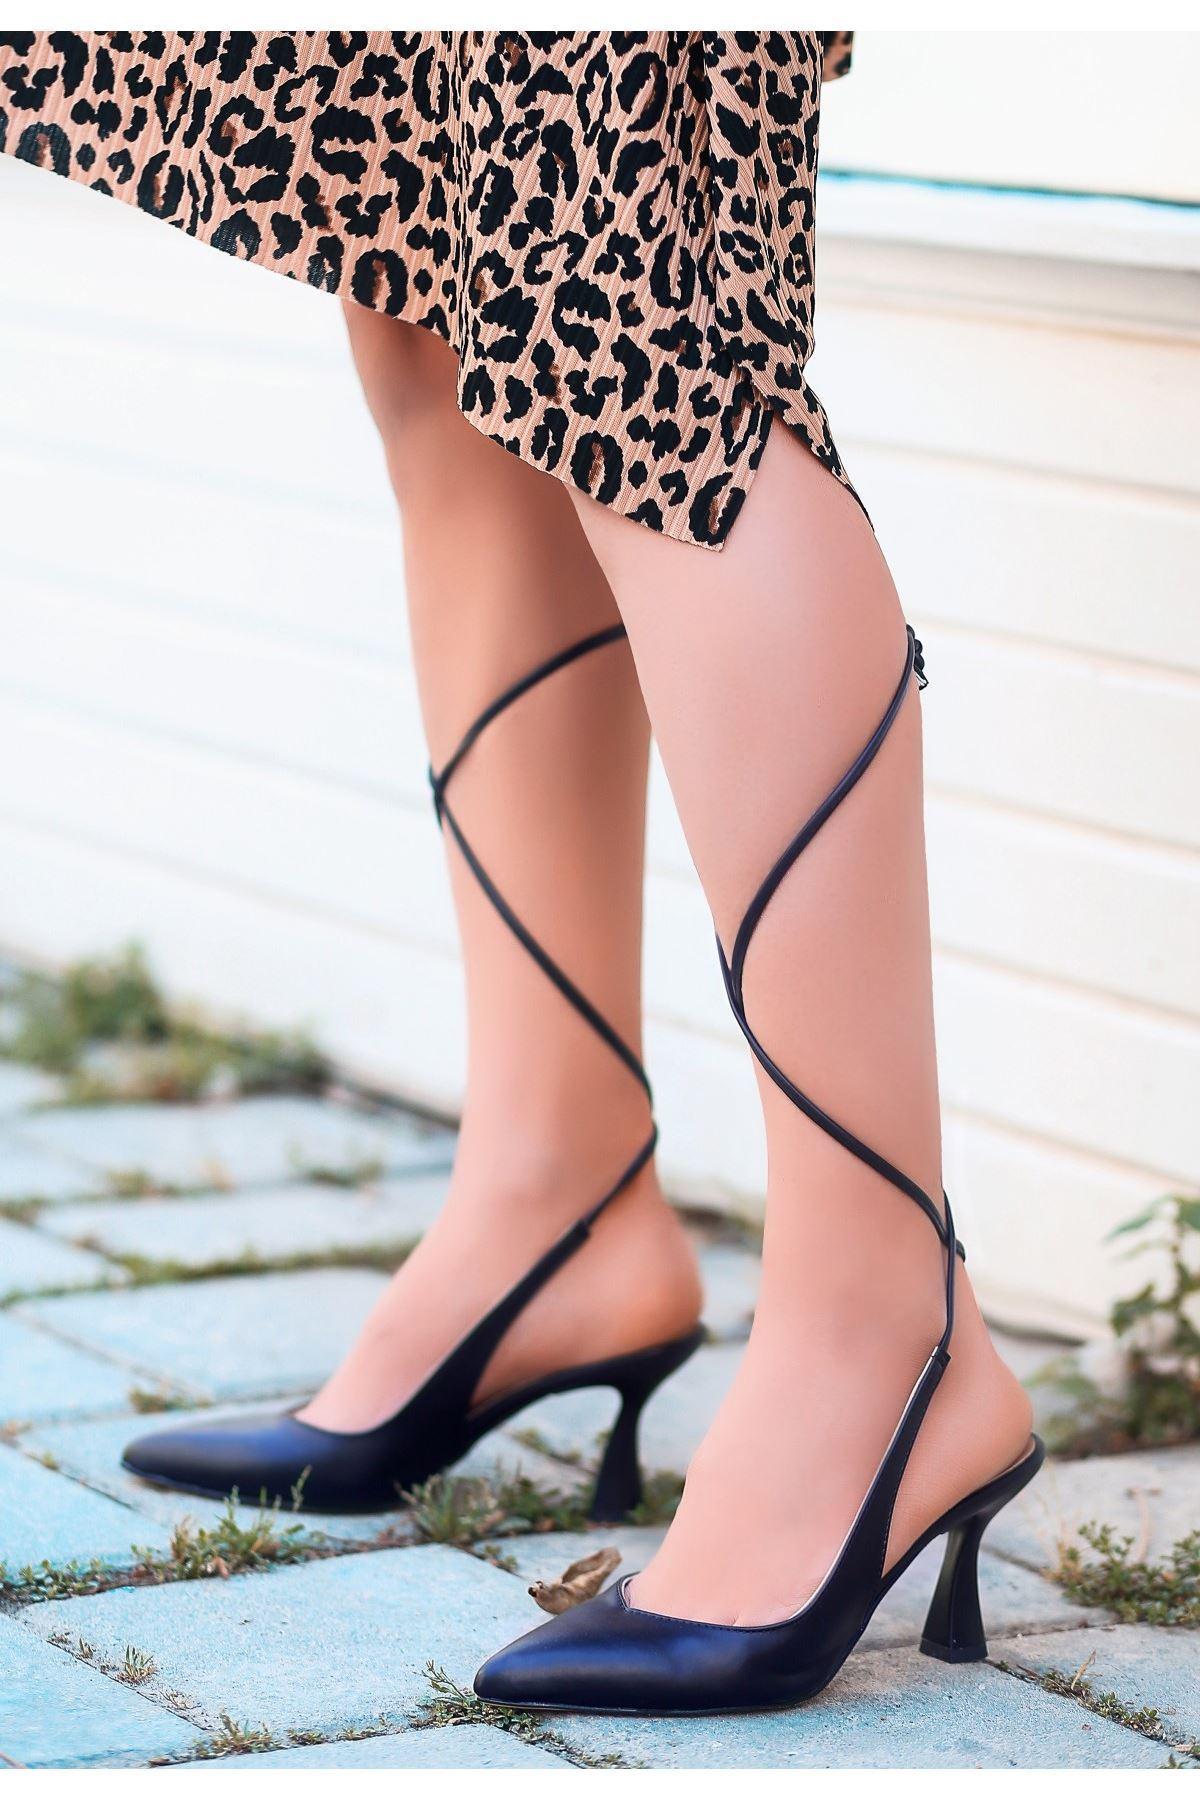 Wonna Siyah Cilt Topuklu Ayakkabı